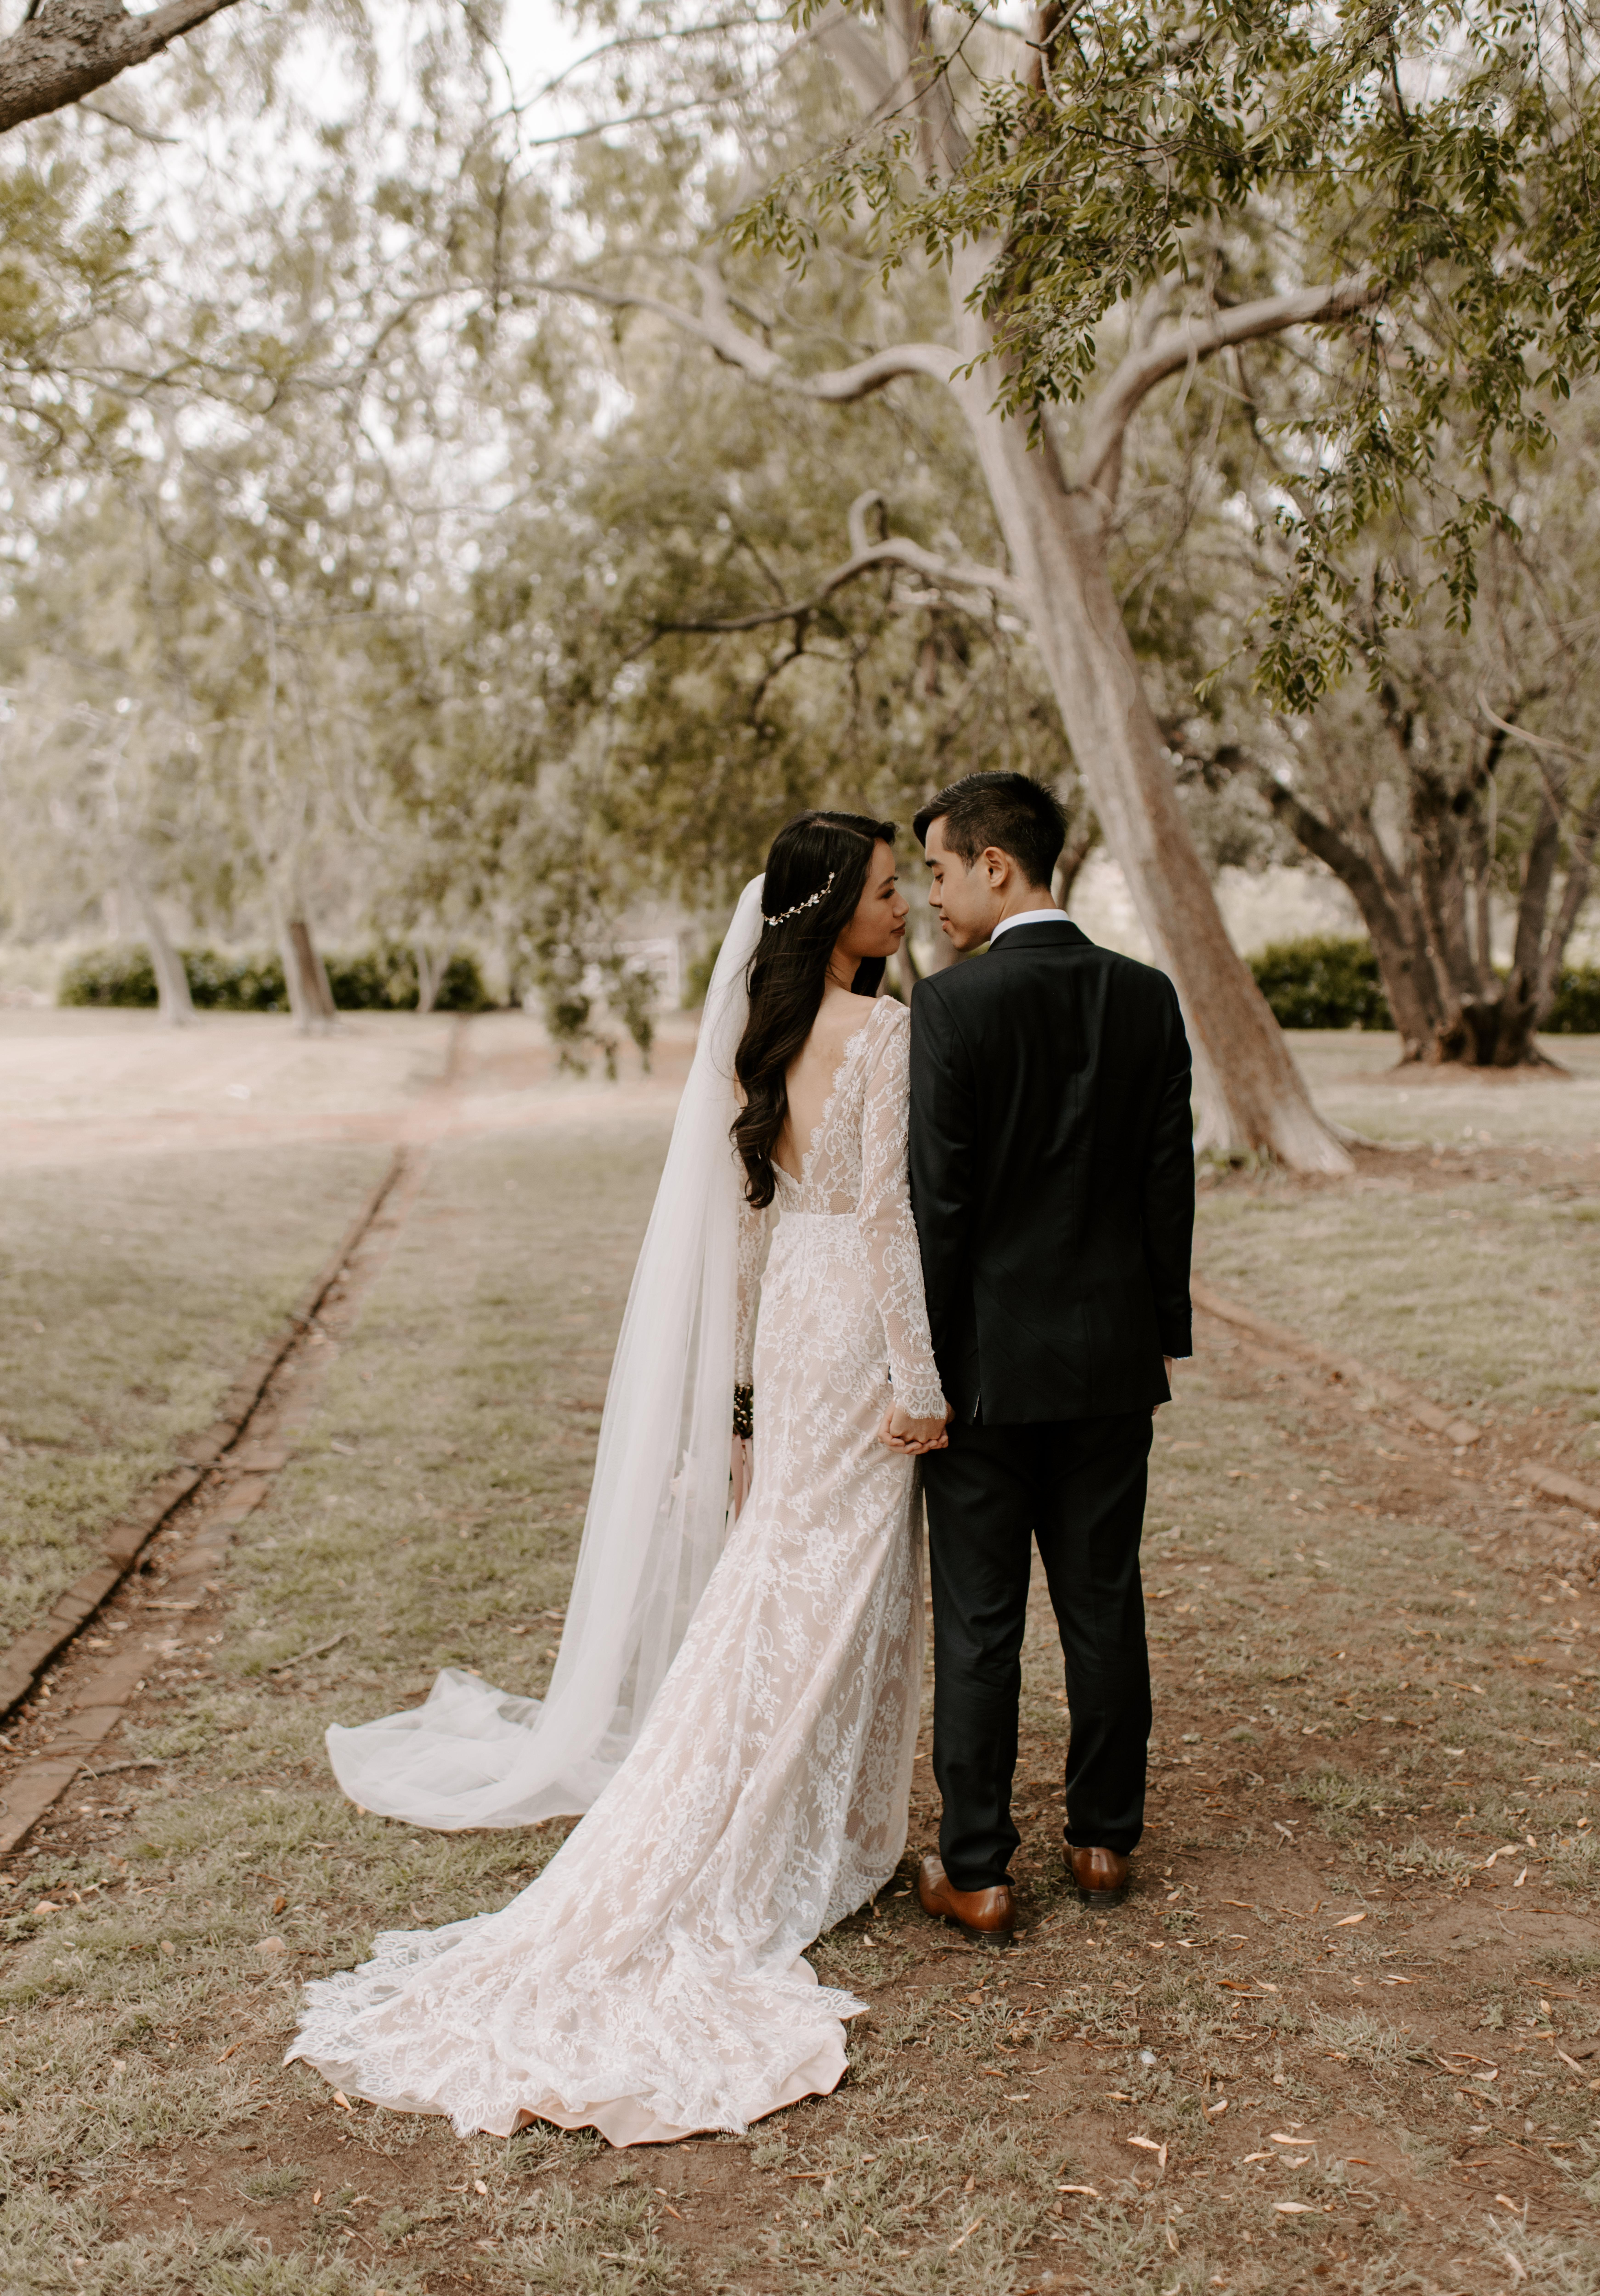 courtney-dickson-our-wedding-video-sydney-australia-boho-emotional-beautiful